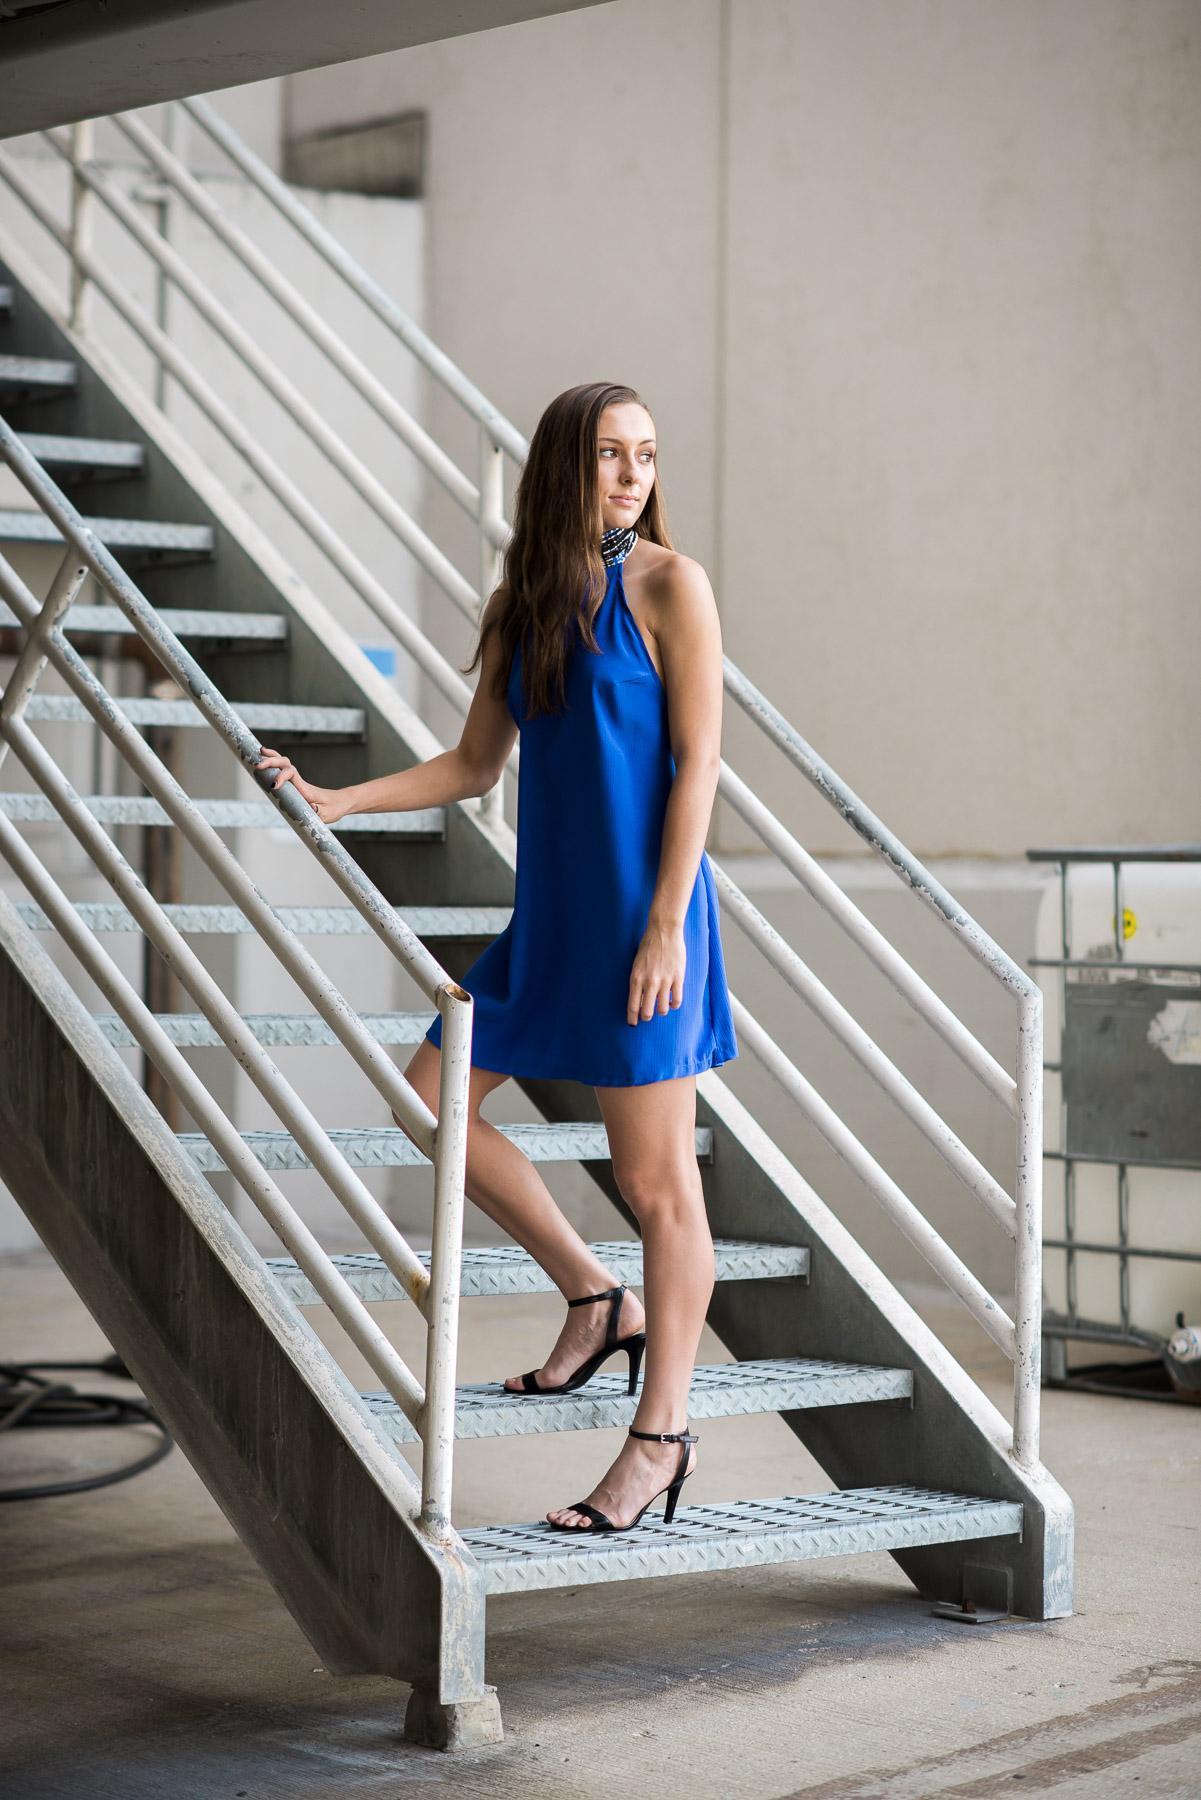 KateTaramykinStudios-Orlando-Fashion-Portraits-MID-23.jpg